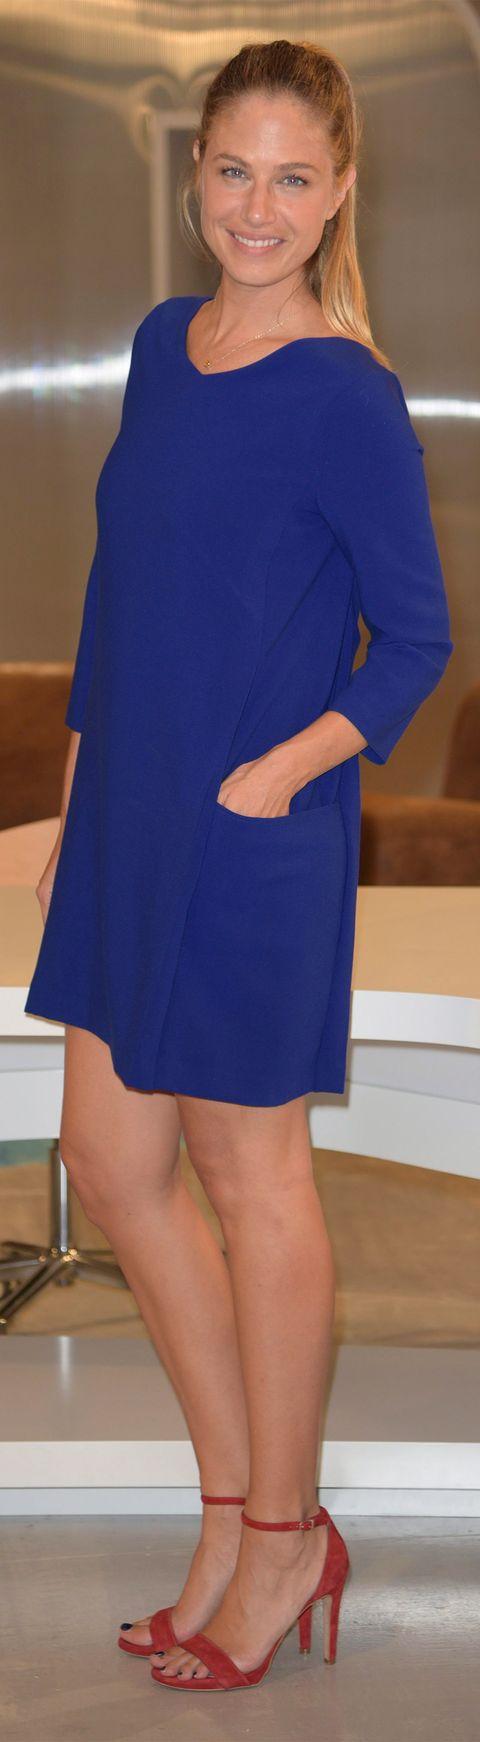 Cobalt blue, Clothing, Blue, Electric blue, Human leg, Shoulder, Dress, Leg, High heels, Footwear,